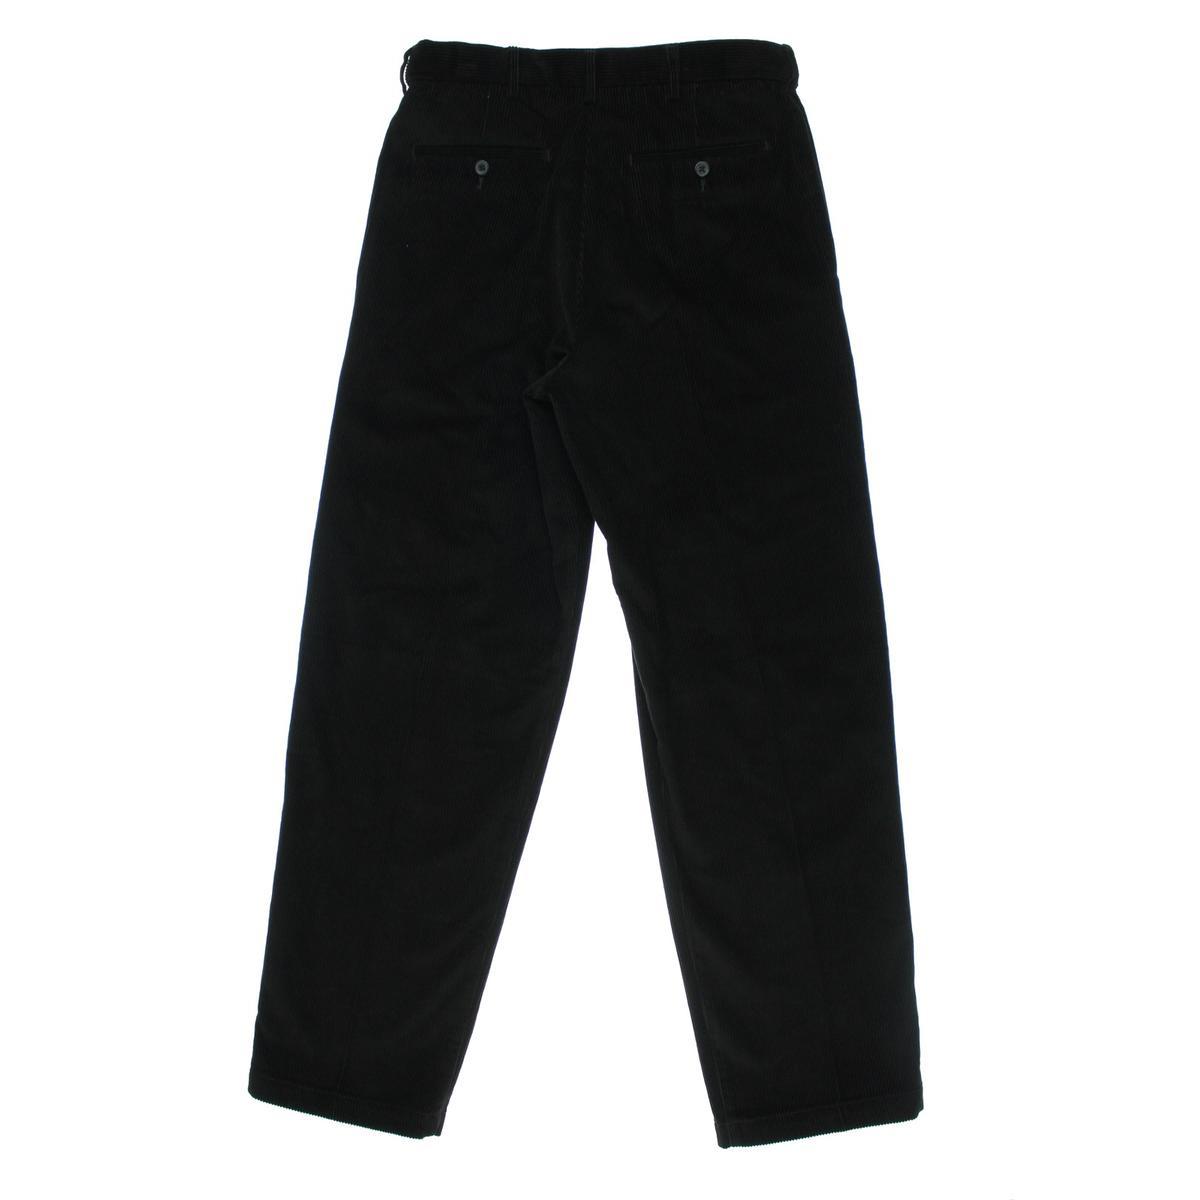 mens comfort waist corduroy pants - Pi Pants